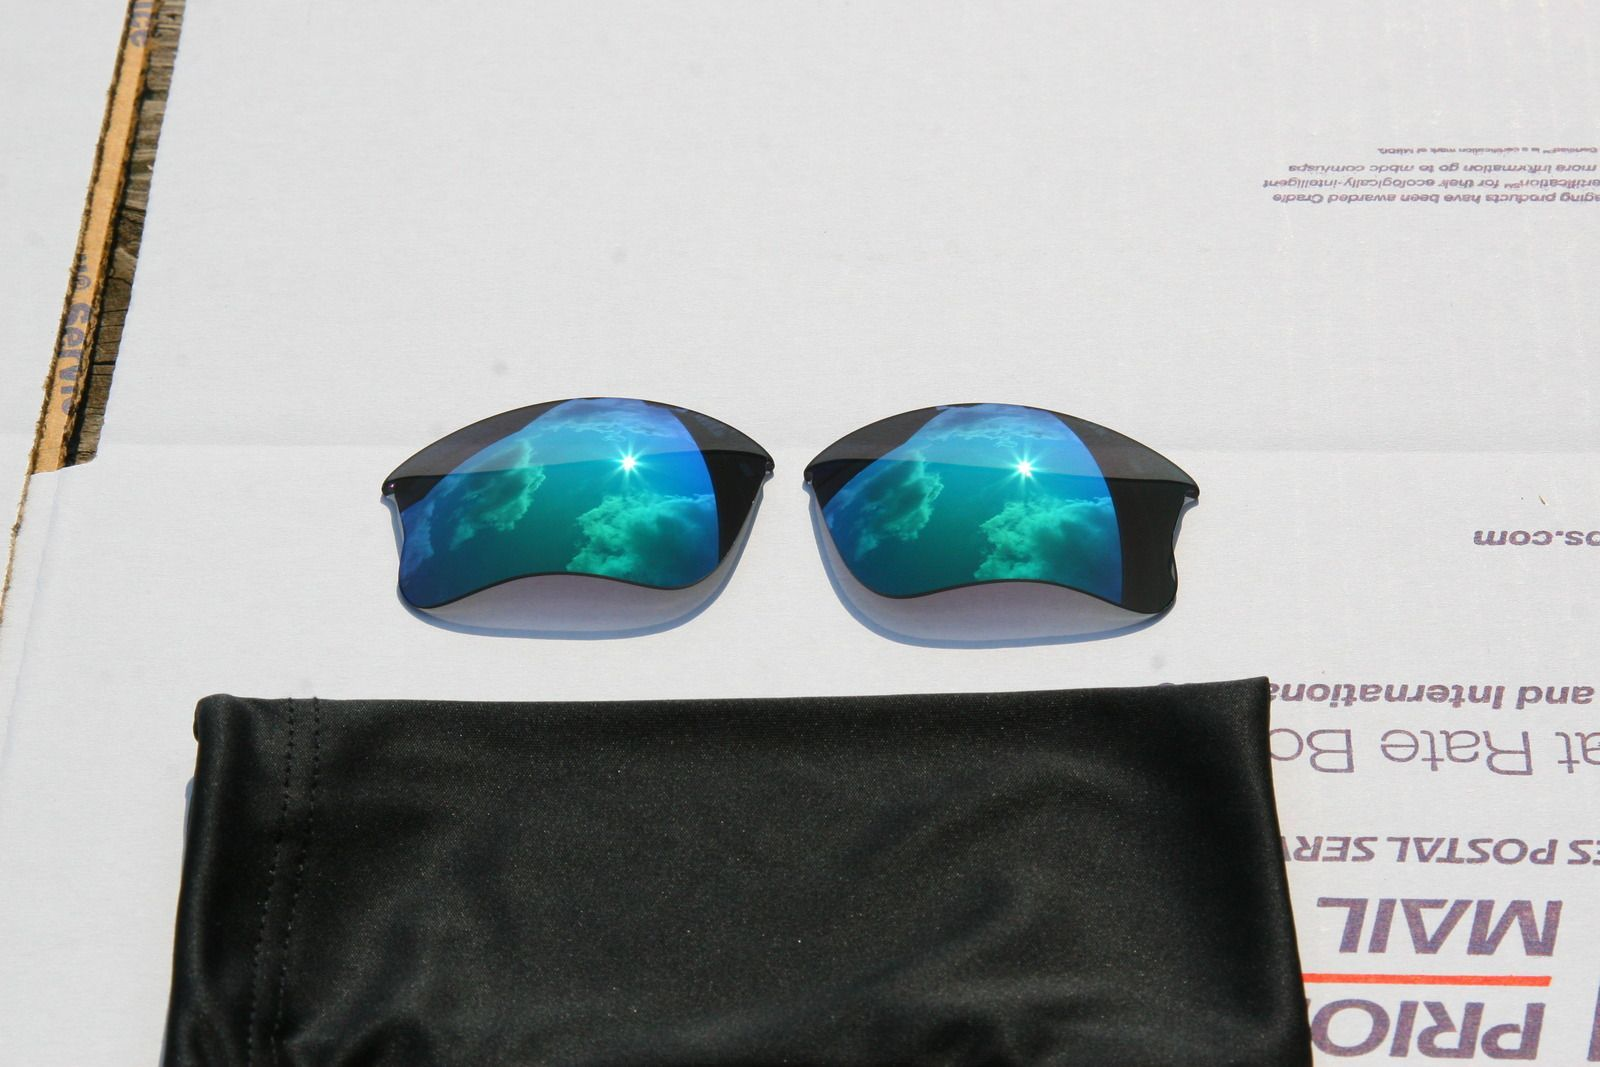 Oakley Flak Jacket Infrared Frame 03-896 And Jade Iridium XLJ Lenses - uujj.jpg